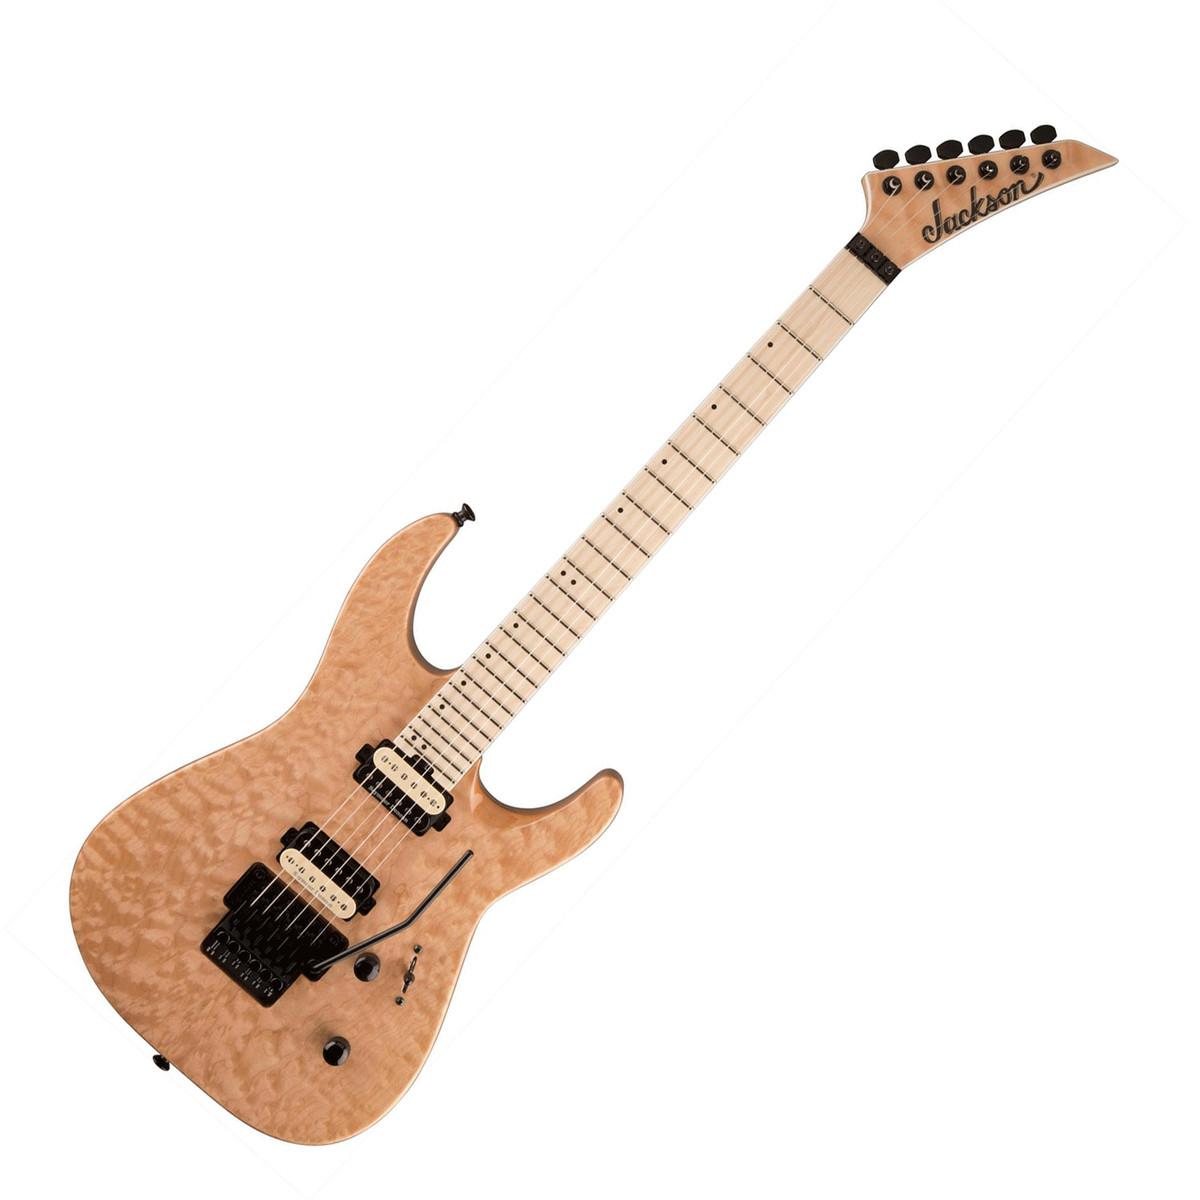 disc jackson pro dinky dk2qm electric guitar natural blonde at gear4music. Black Bedroom Furniture Sets. Home Design Ideas